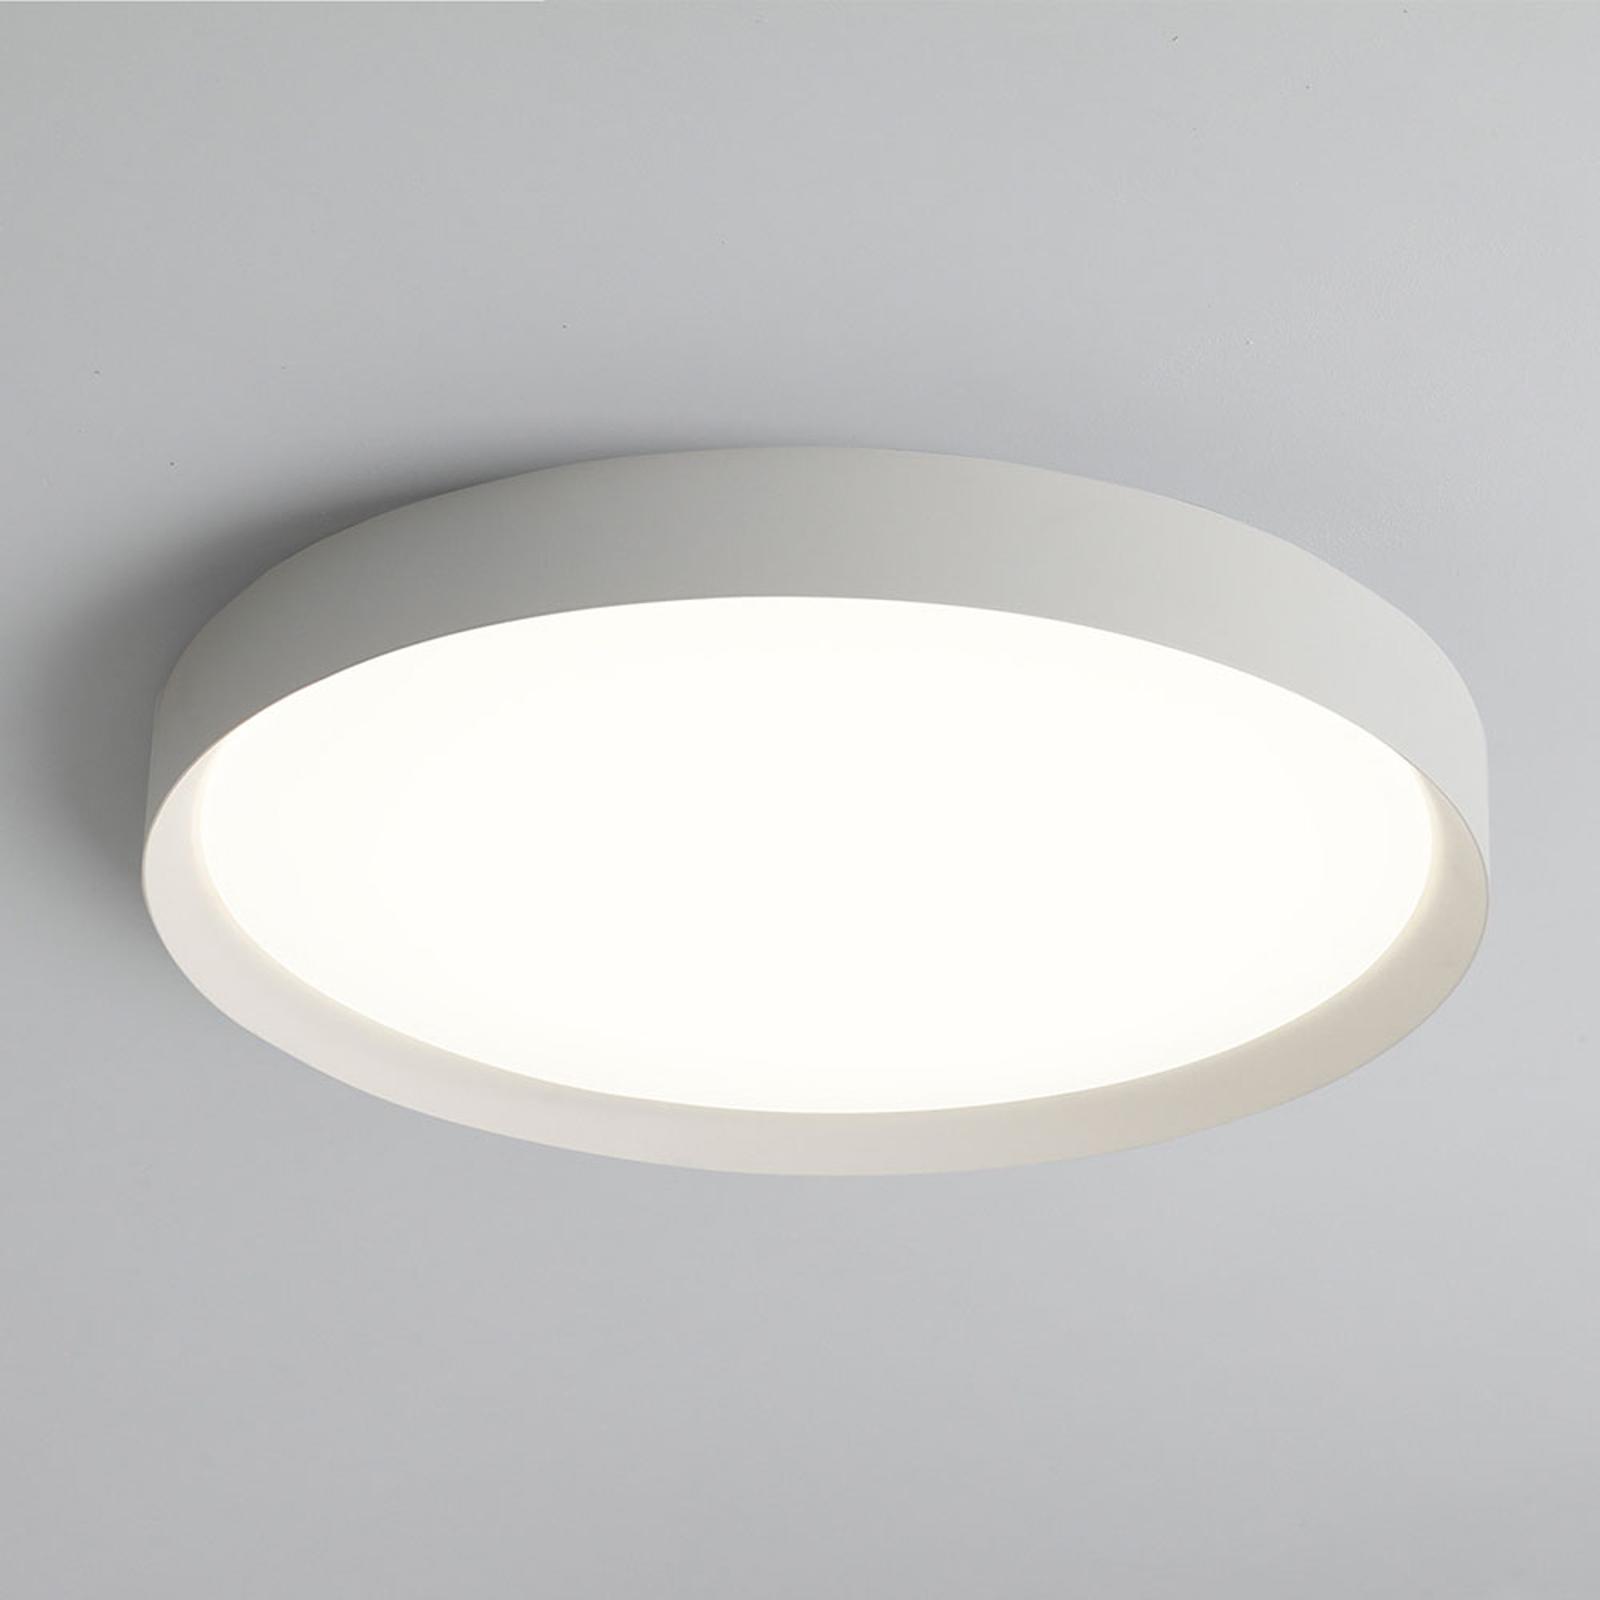 Plafonnier LED Minsk DALI Ø 60cm Casambi blanc